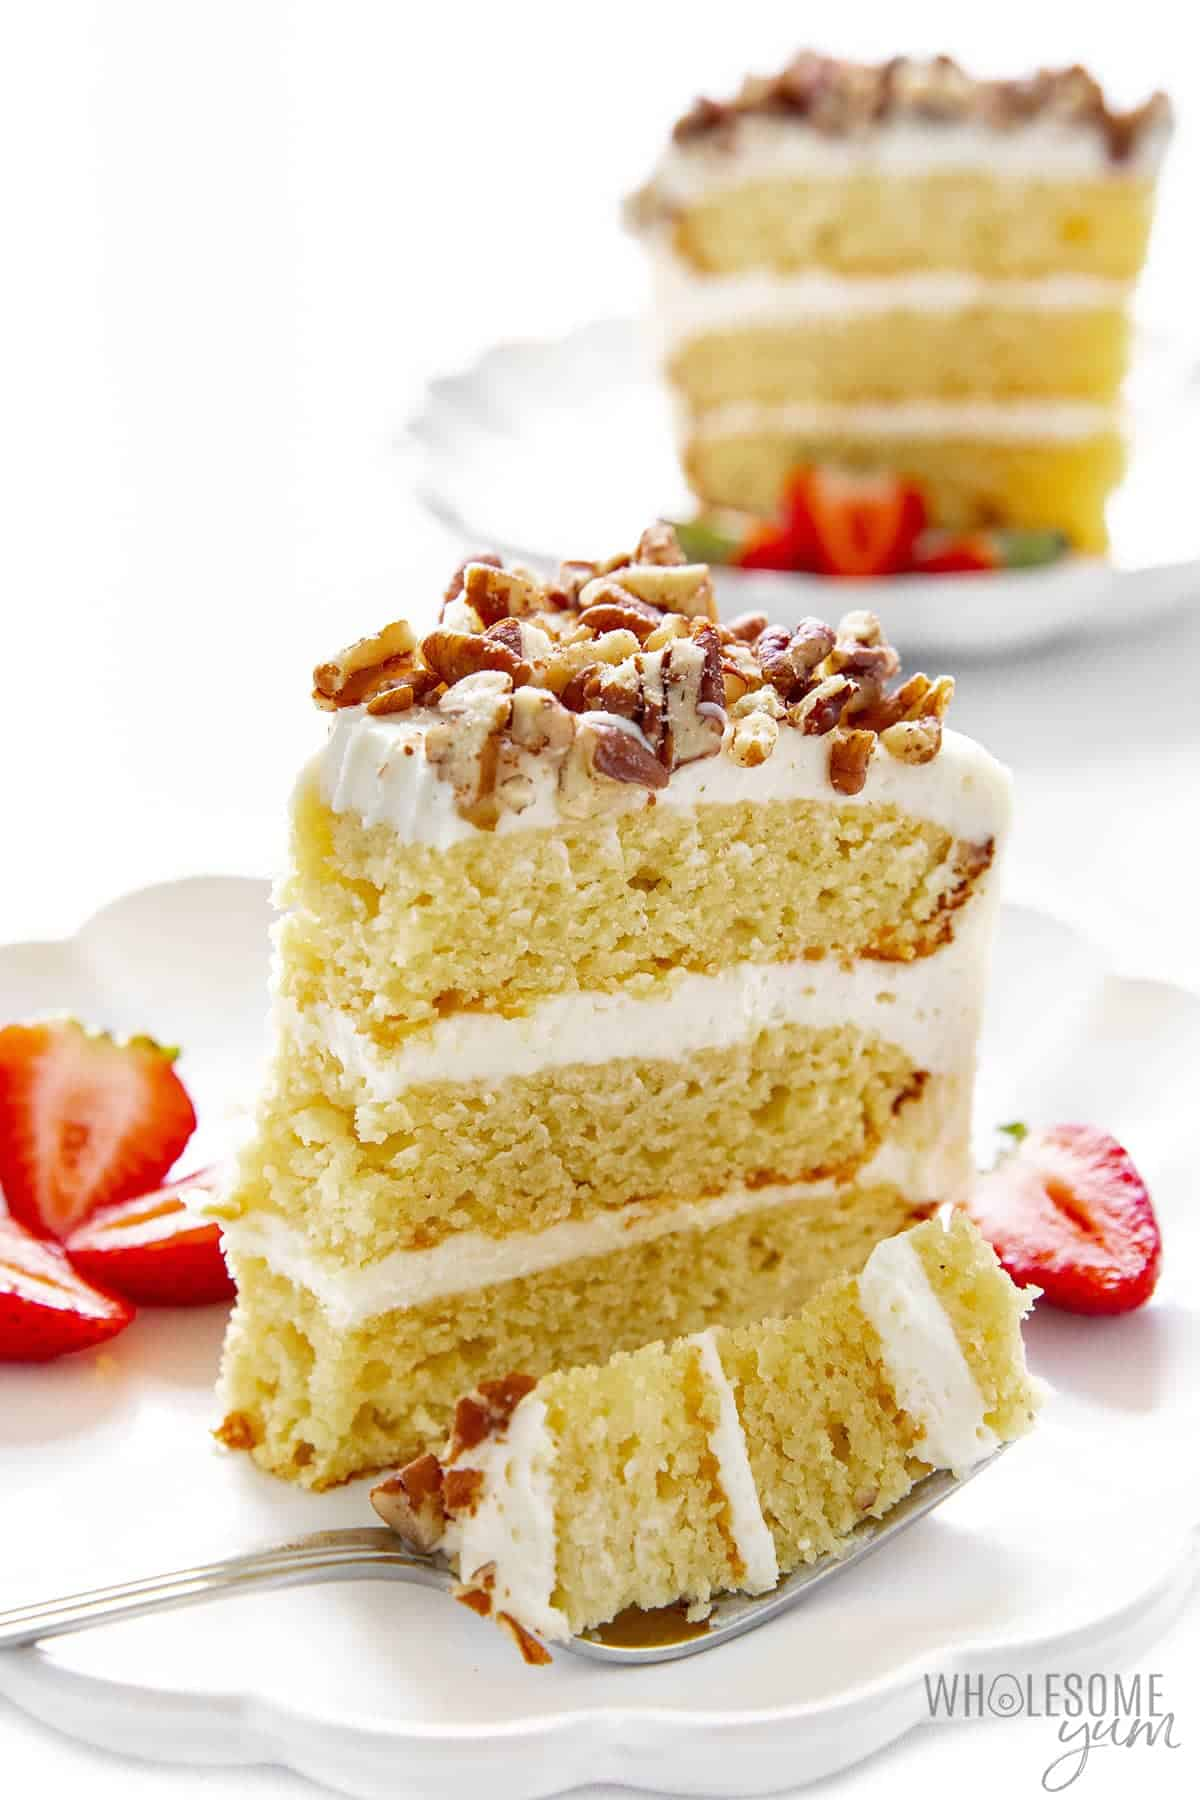 Slice of keto vanilla cake with fork